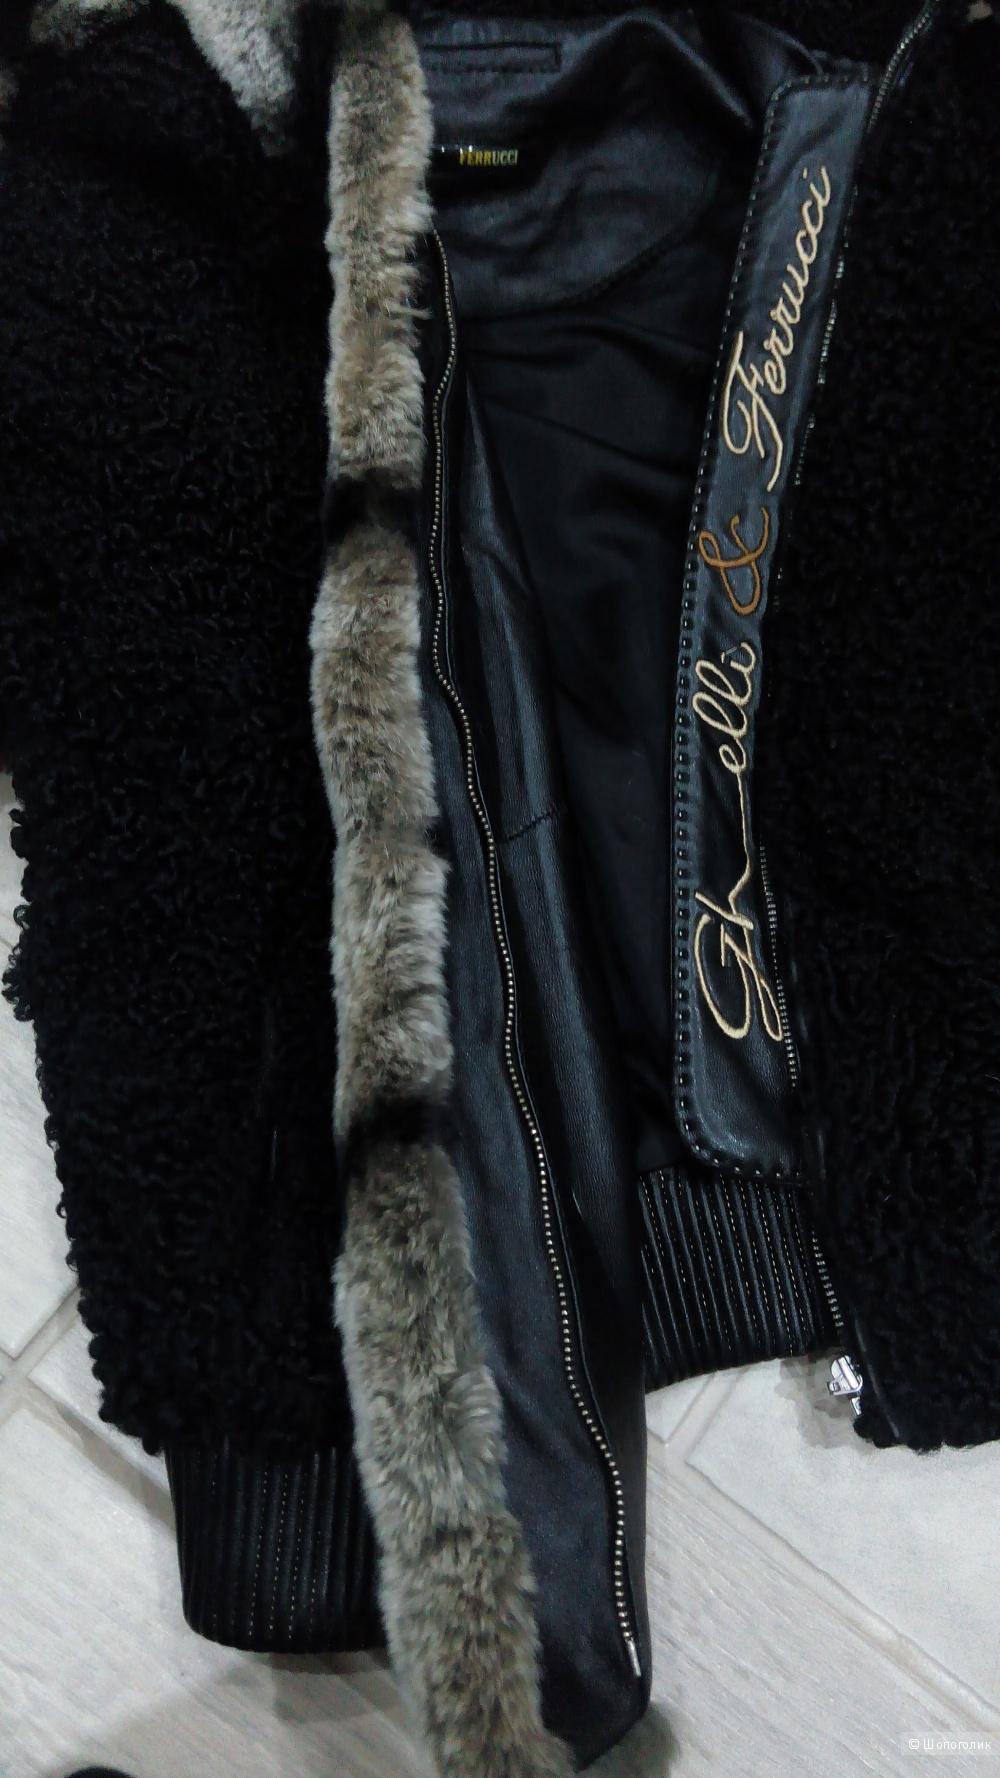 Куртка из натурального каракуля, Ferrucci, xs-s